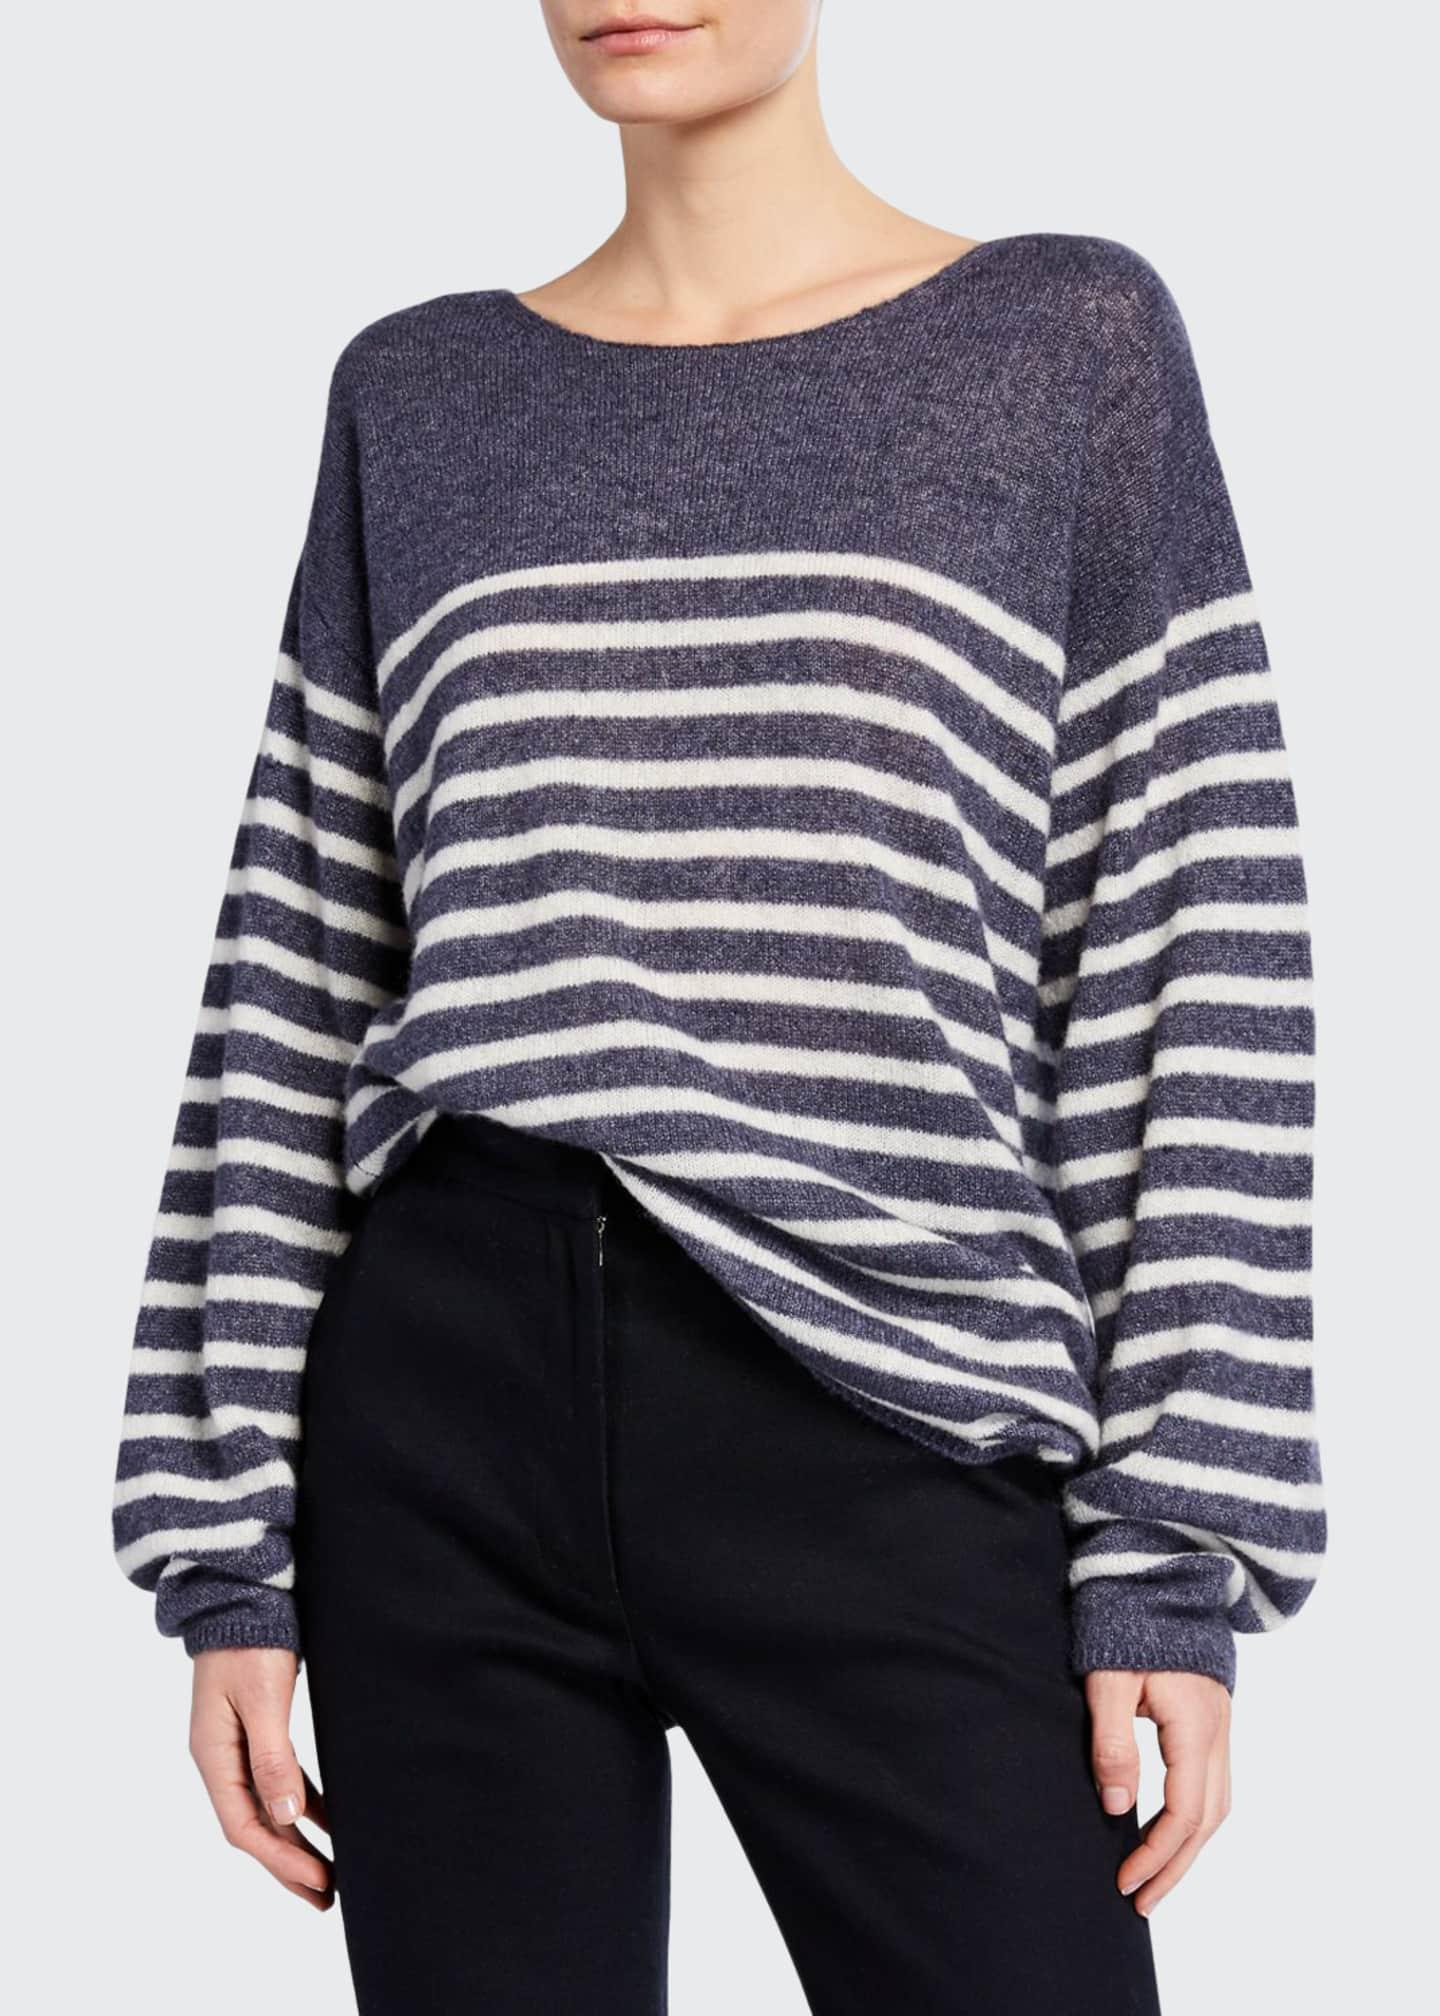 Adam Lippes Brushed-Cashmere Breton-Striped Boat-Neck Sweater